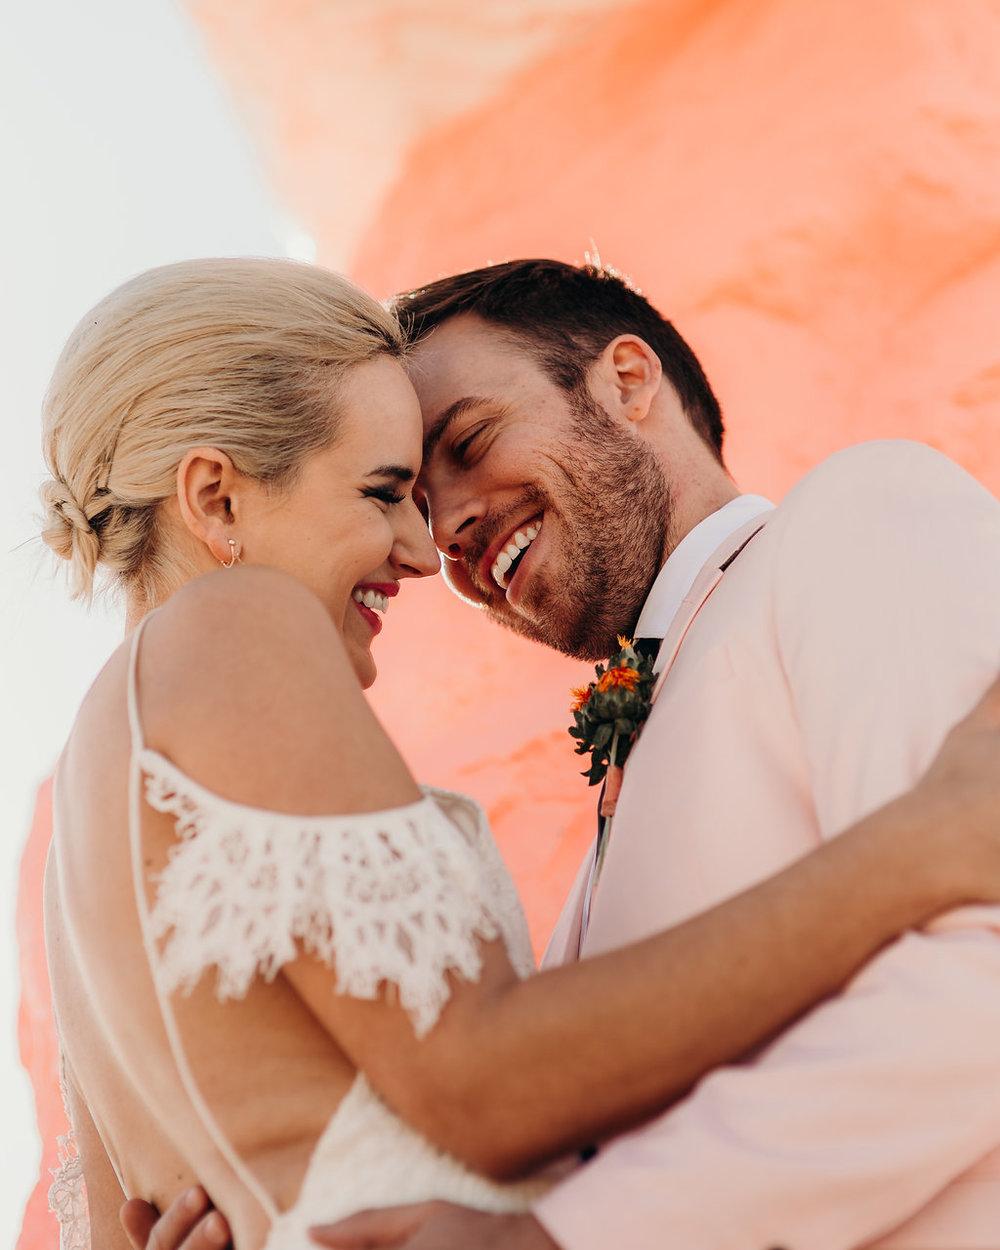 love-fern-design-studio-custom-wedding-invitations-for-the-modern-couple-modern-calligraphy-in-seattle-washington-custom-wedding-stationery-neon-acrylic-retro-Vegas-elopement-seven-magic-mountains